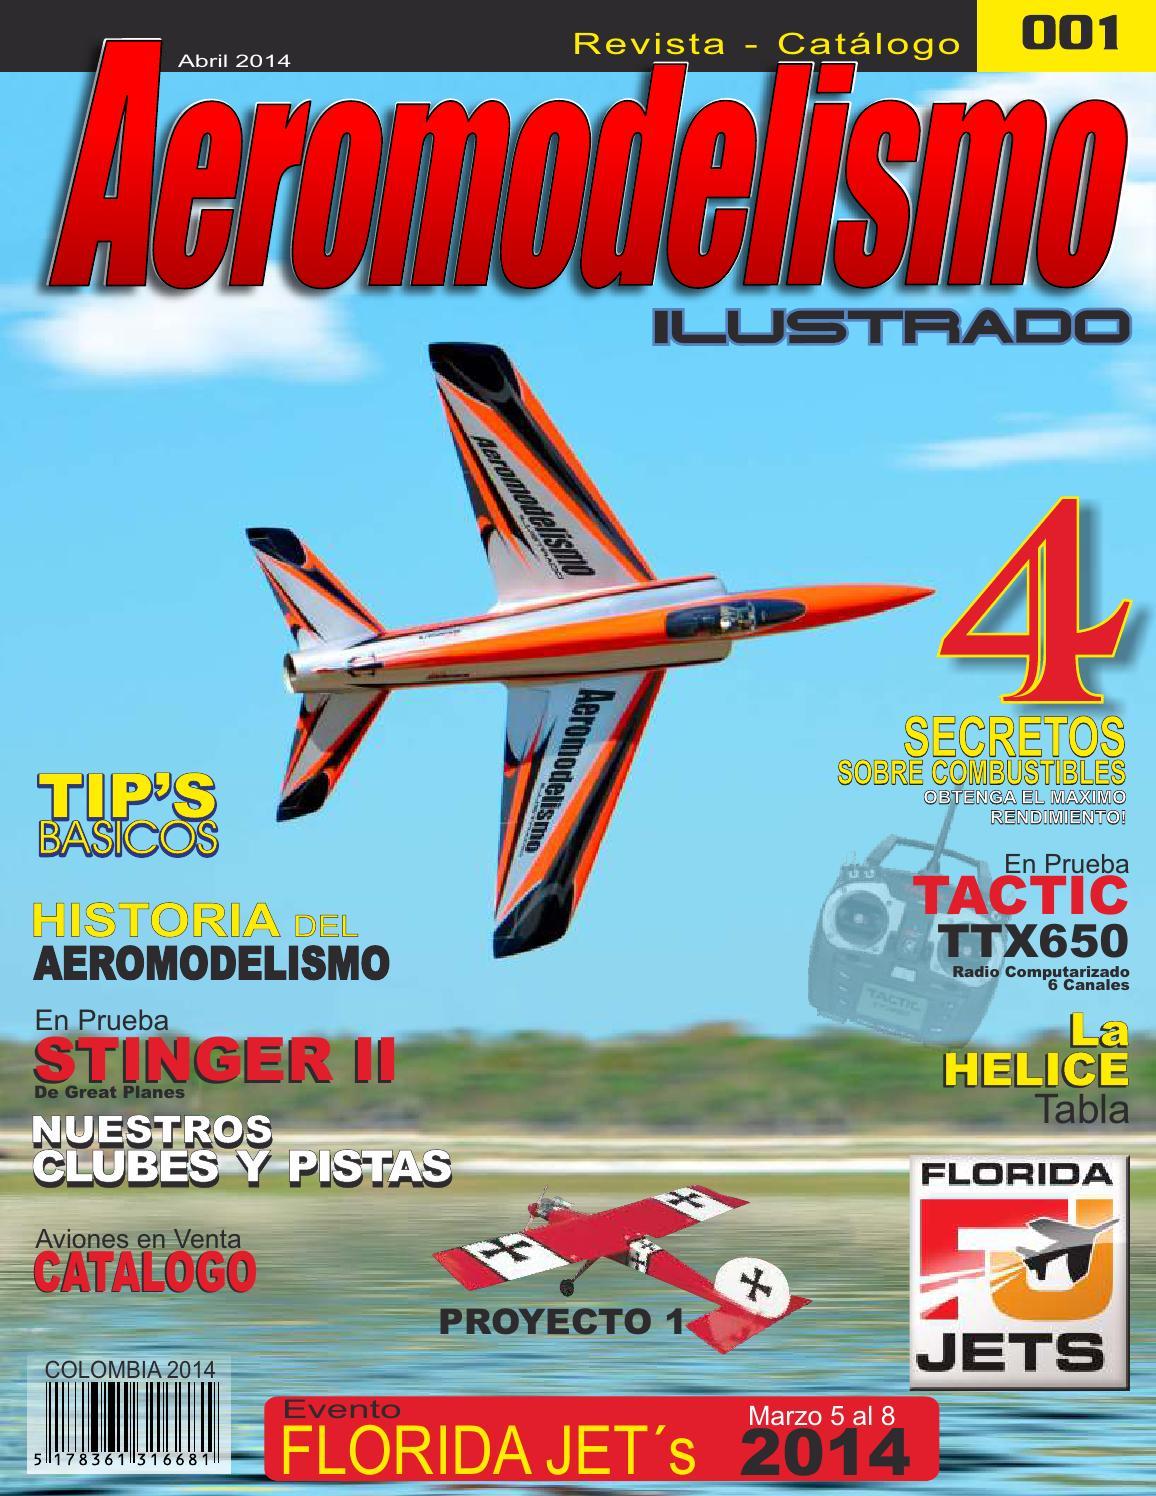 Revista Aeromodelismo Ilustrado Catalogo 1 by Aeromodelismo ...